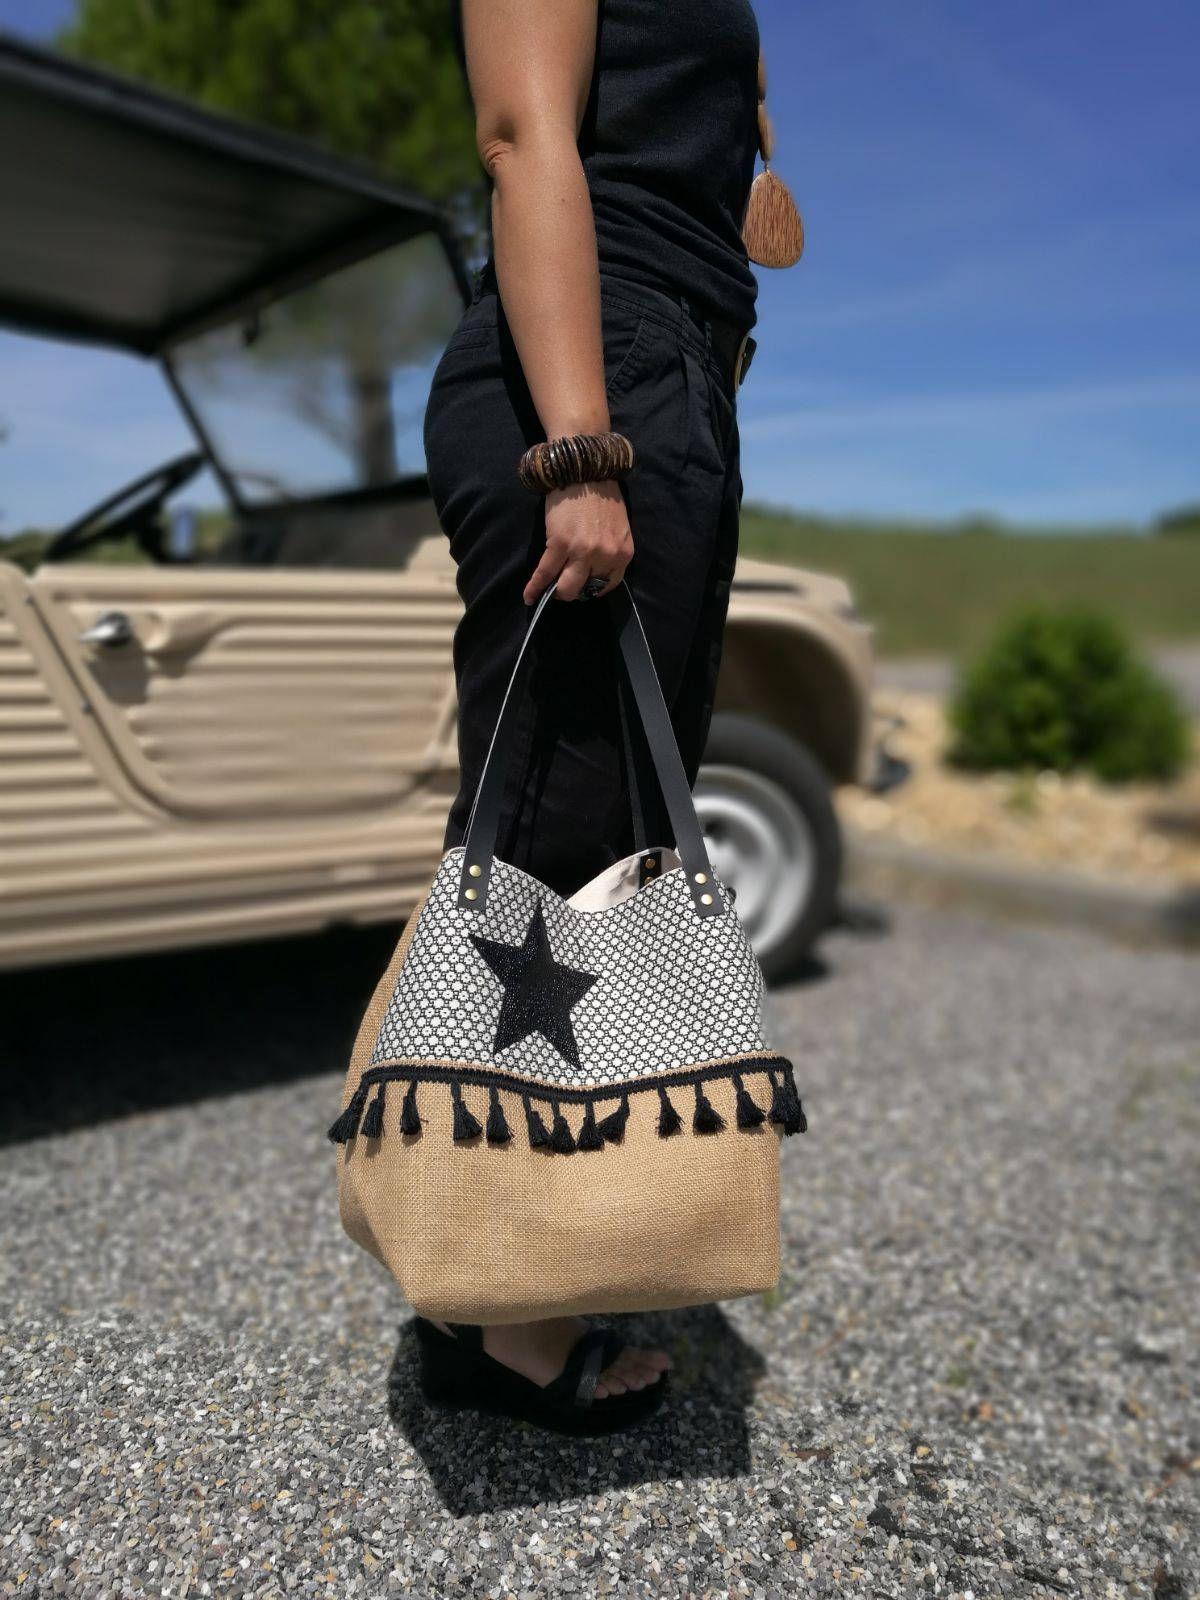 tote bag black star burlap woven cotton and imitation. Black Bedroom Furniture Sets. Home Design Ideas